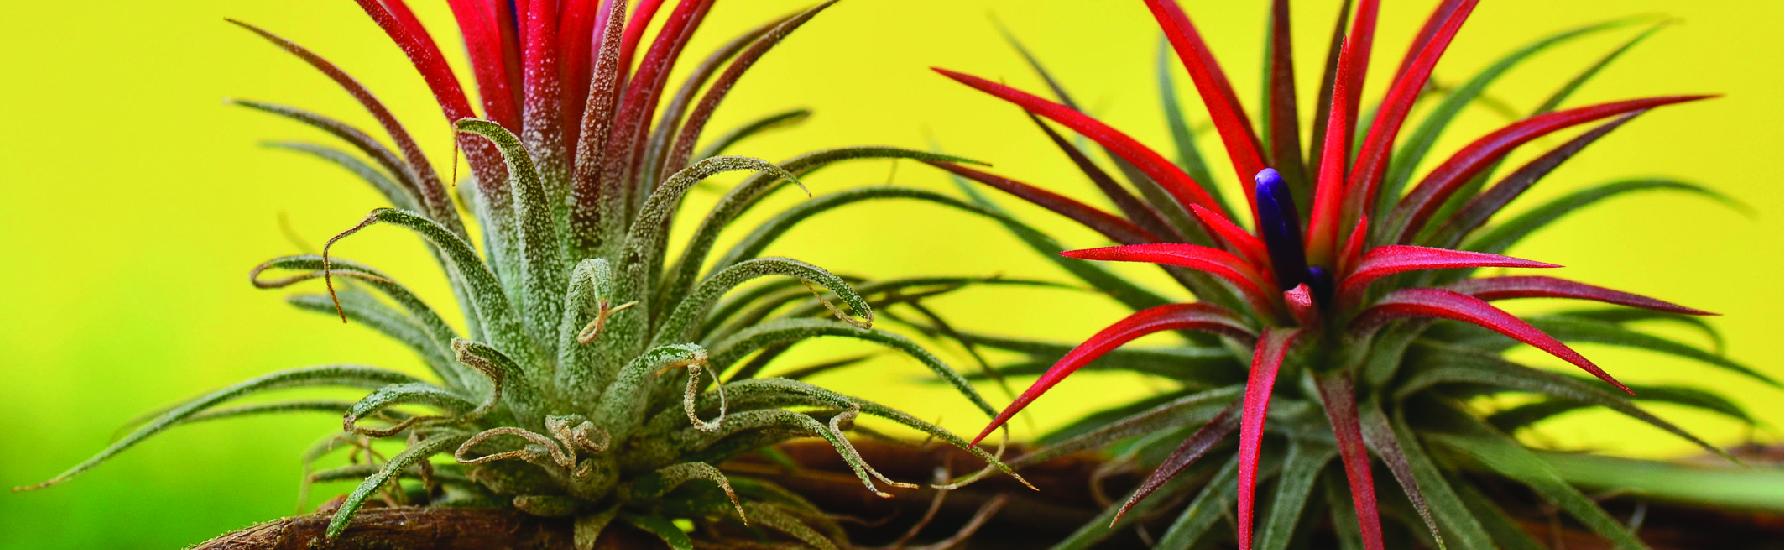 Best Bromeliads For Full Sun Bromeliadsfo